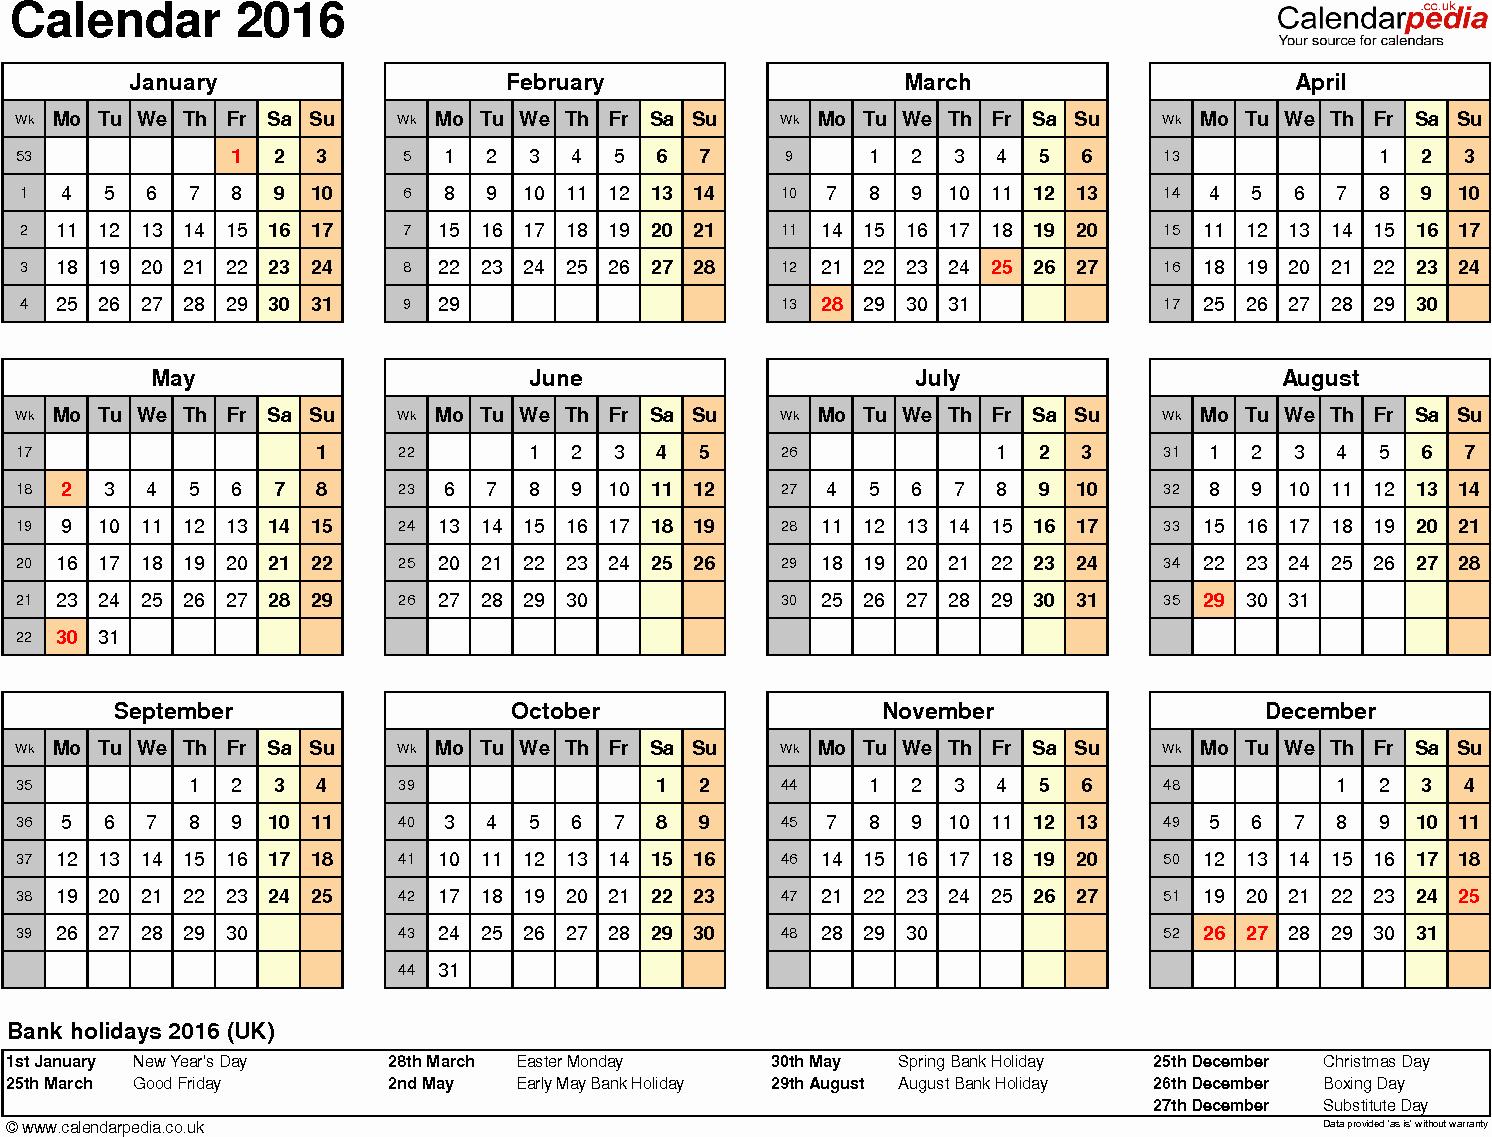 Free Year Calendar Template 2016 Luxury Calendar 2016 Uk 16 Free Printable Word Templates